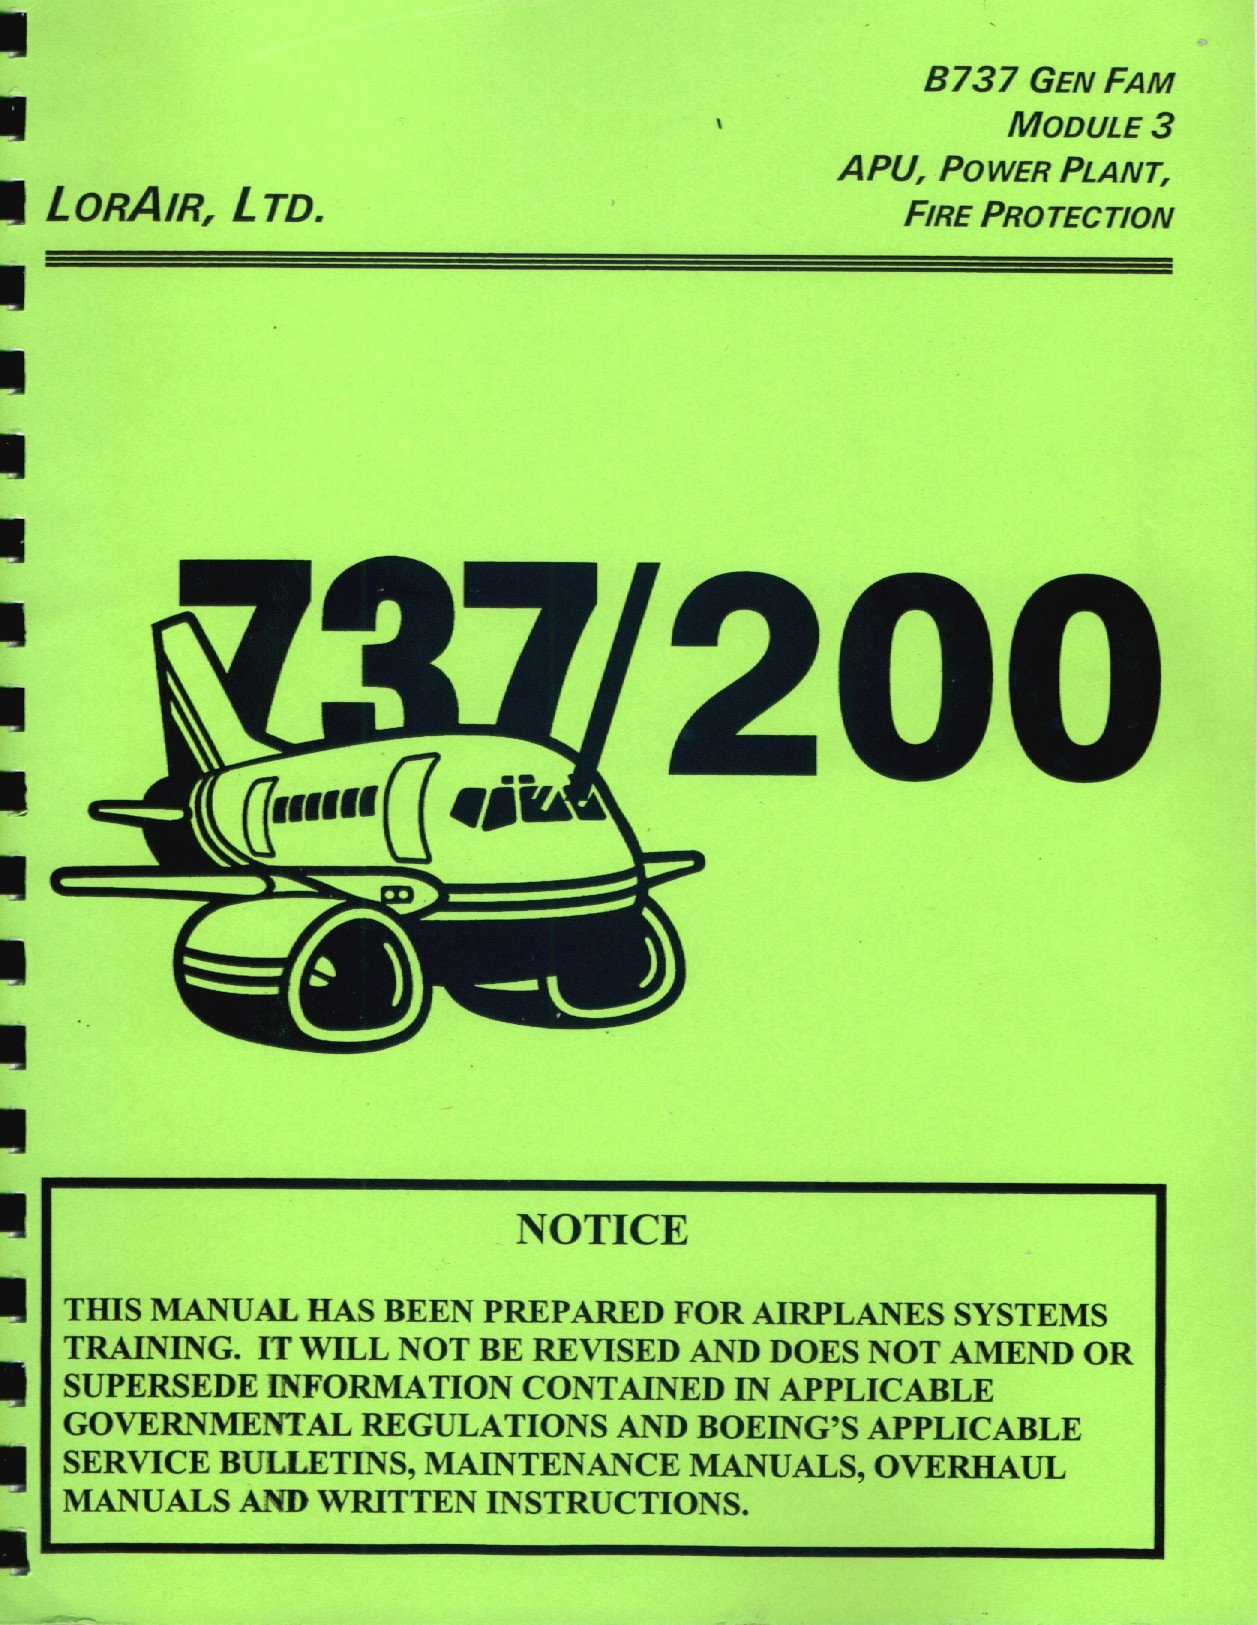 Boeing 737 Gen Fam Module 3 737/200 Maintenance Training Manual - APU,  Power Plant, Fire Protection [Plastic Comb]: Ltd. Boeing 747 Commercial  Airlines ...